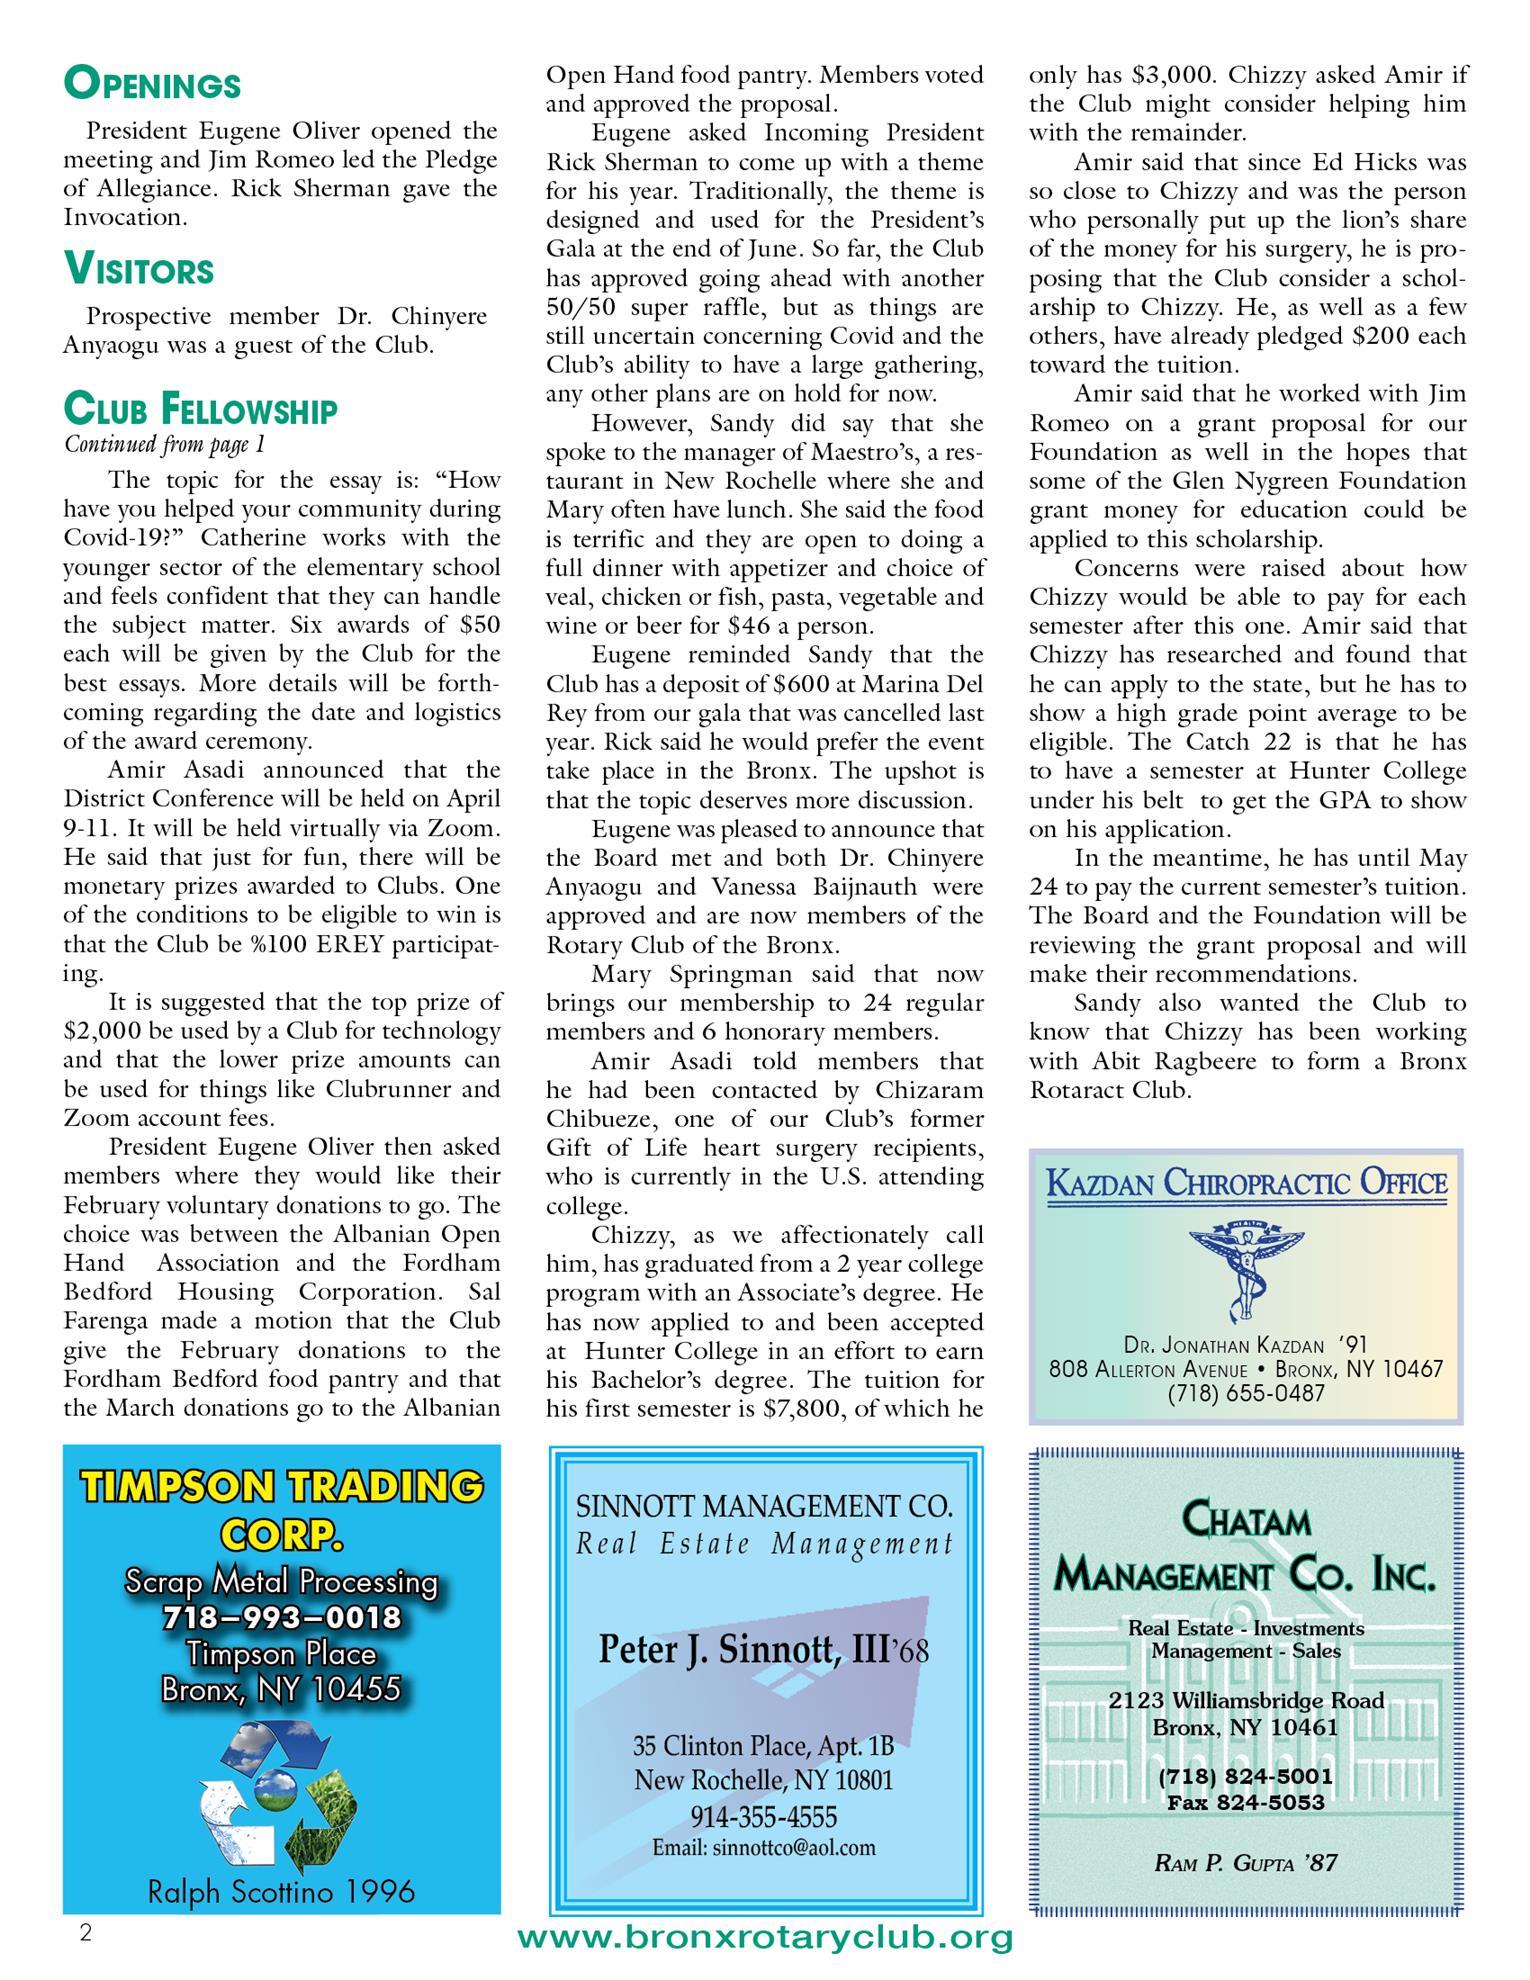 Tuesdays newsletter 2/9, 2/26 & 2/23/2021 p2